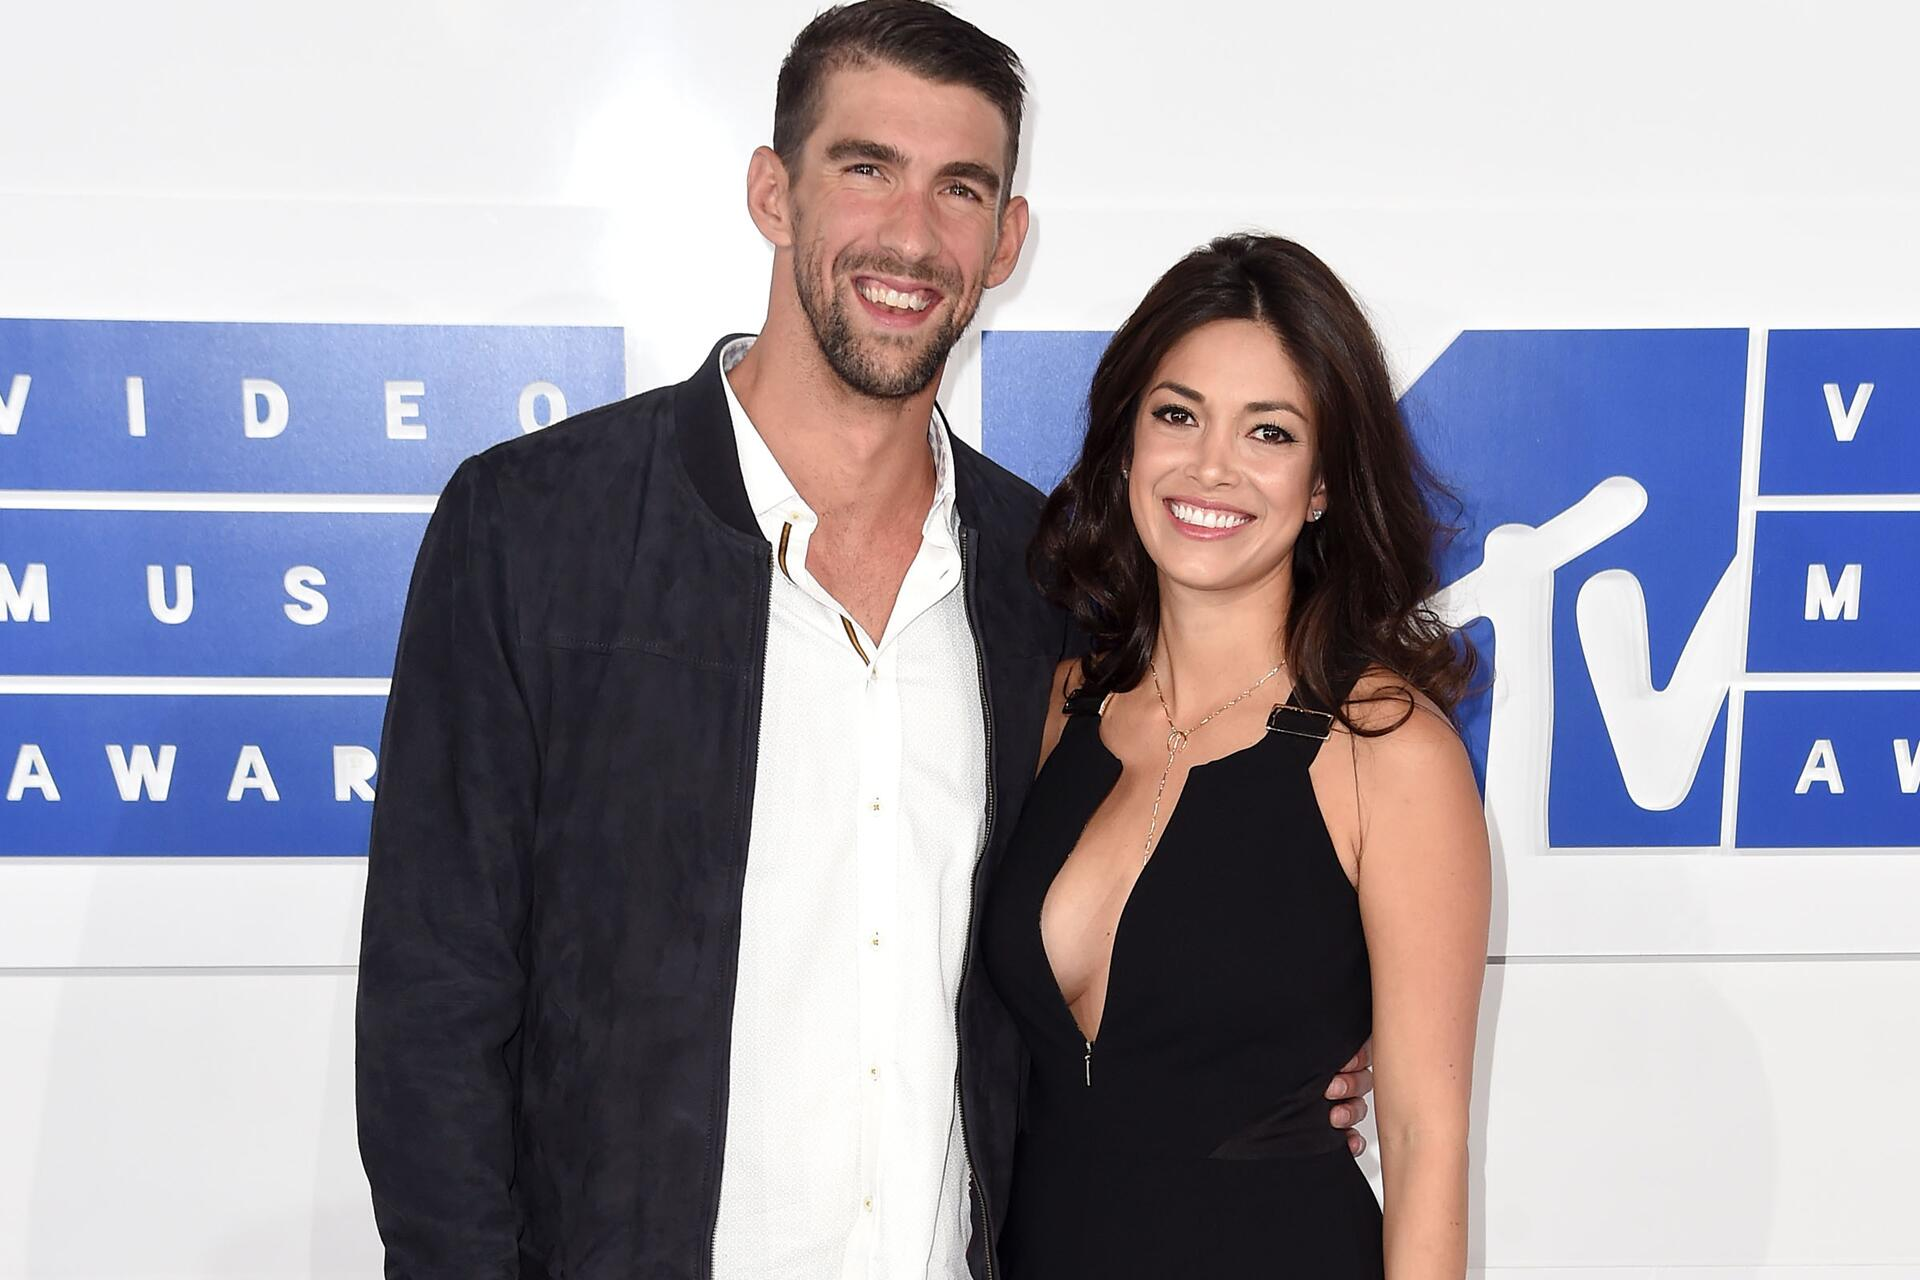 Bild zu Michael Phelps, Nicole Johnson, MTV Video Music Awards